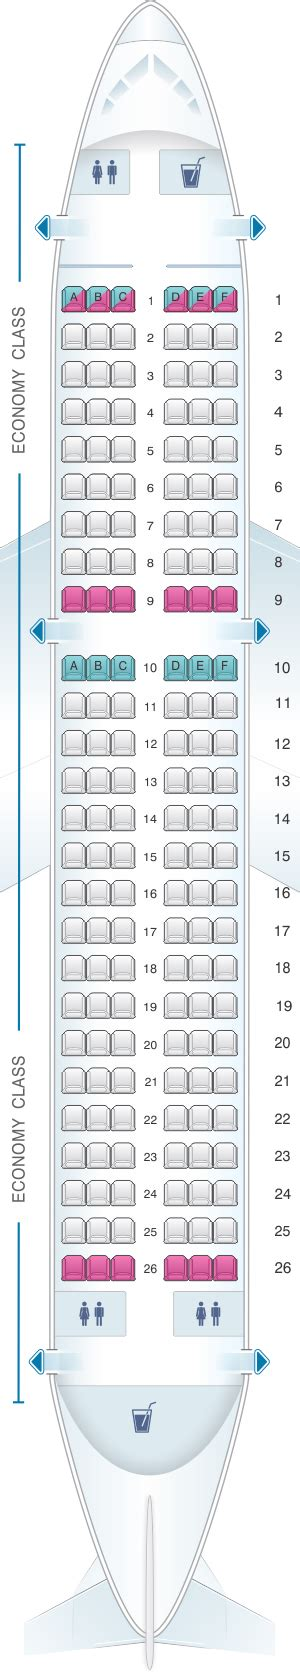 easyjet siege plan de cabine easyjet airbus a319 seatmaestro fr